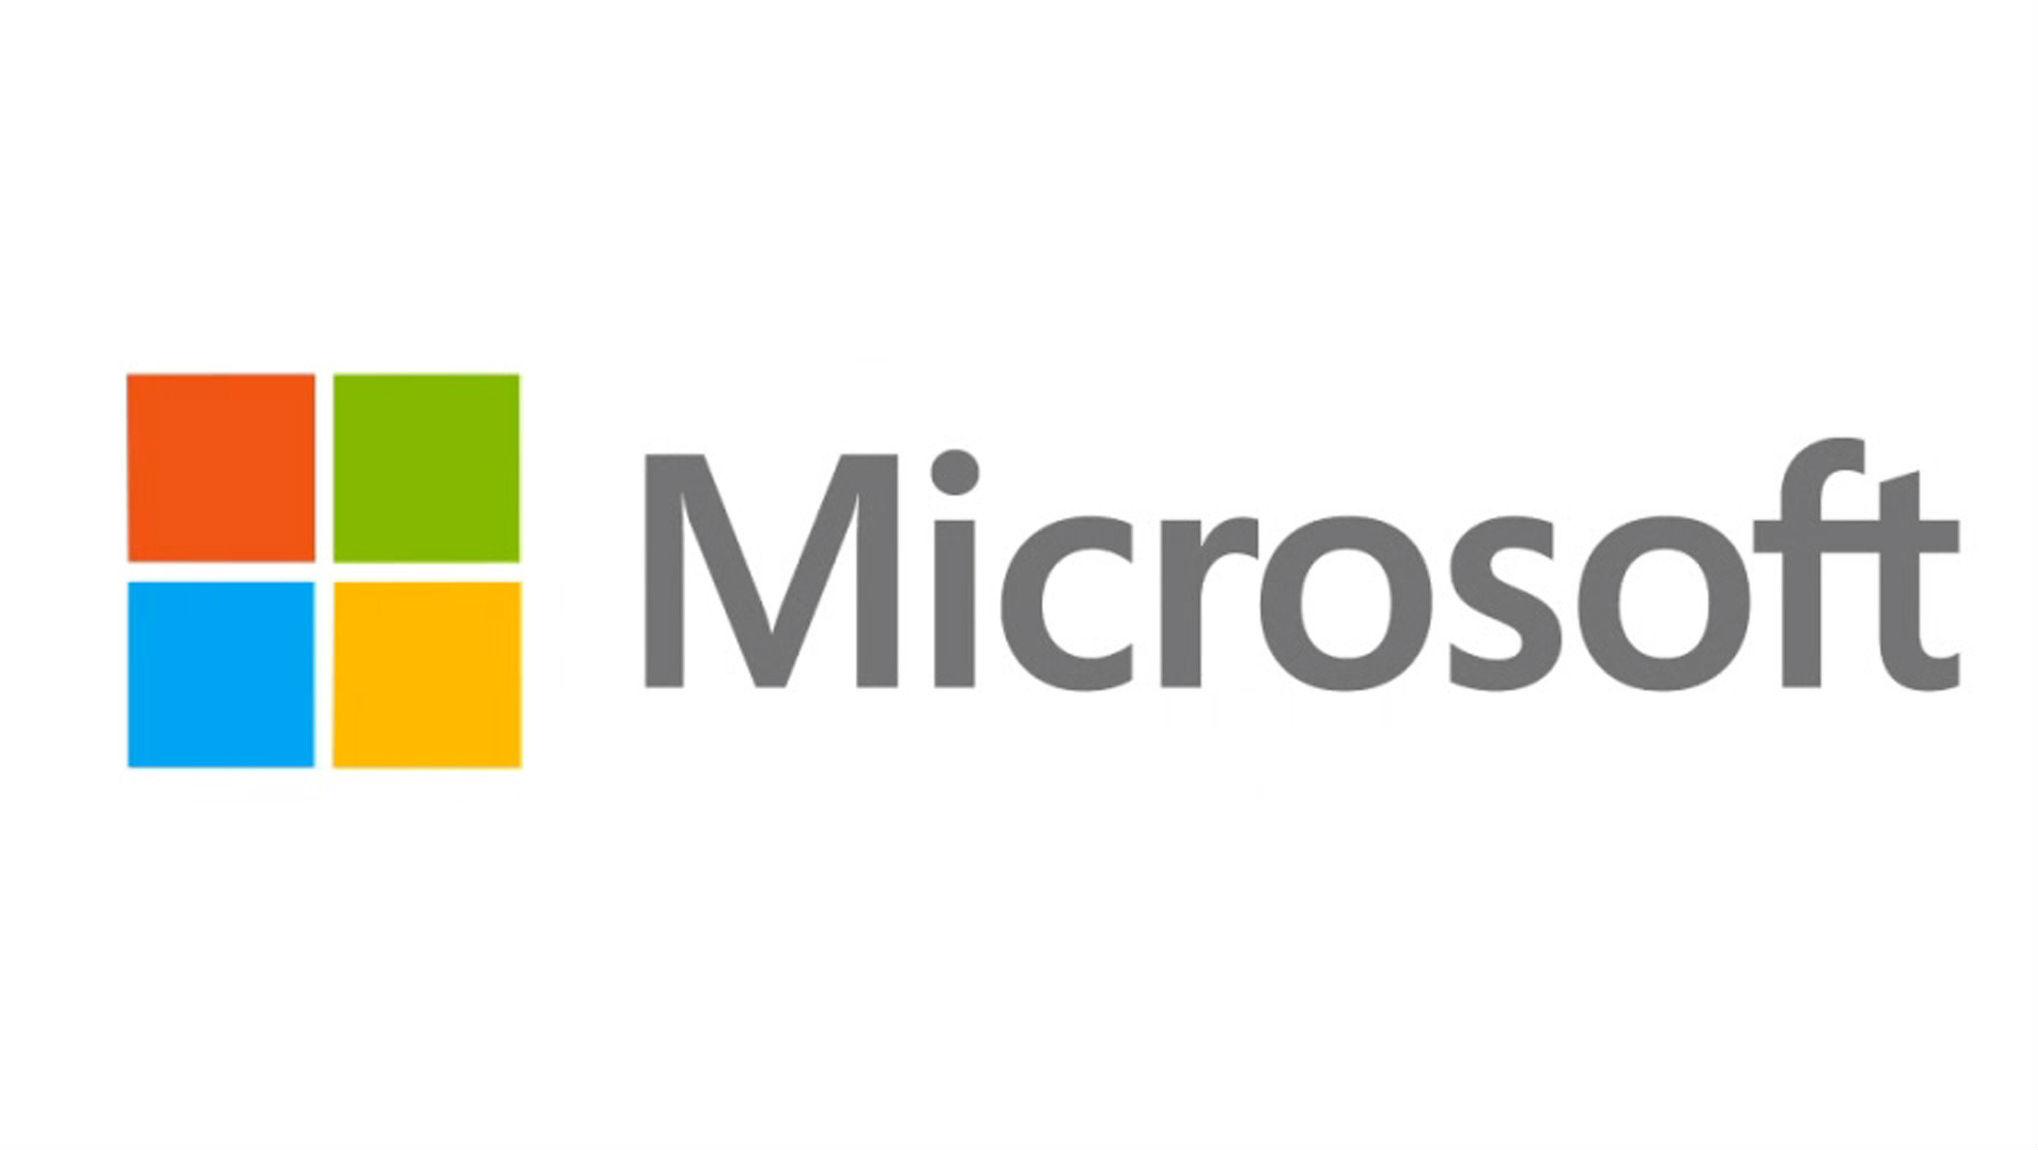 Resultado de imagen para microsoft logo